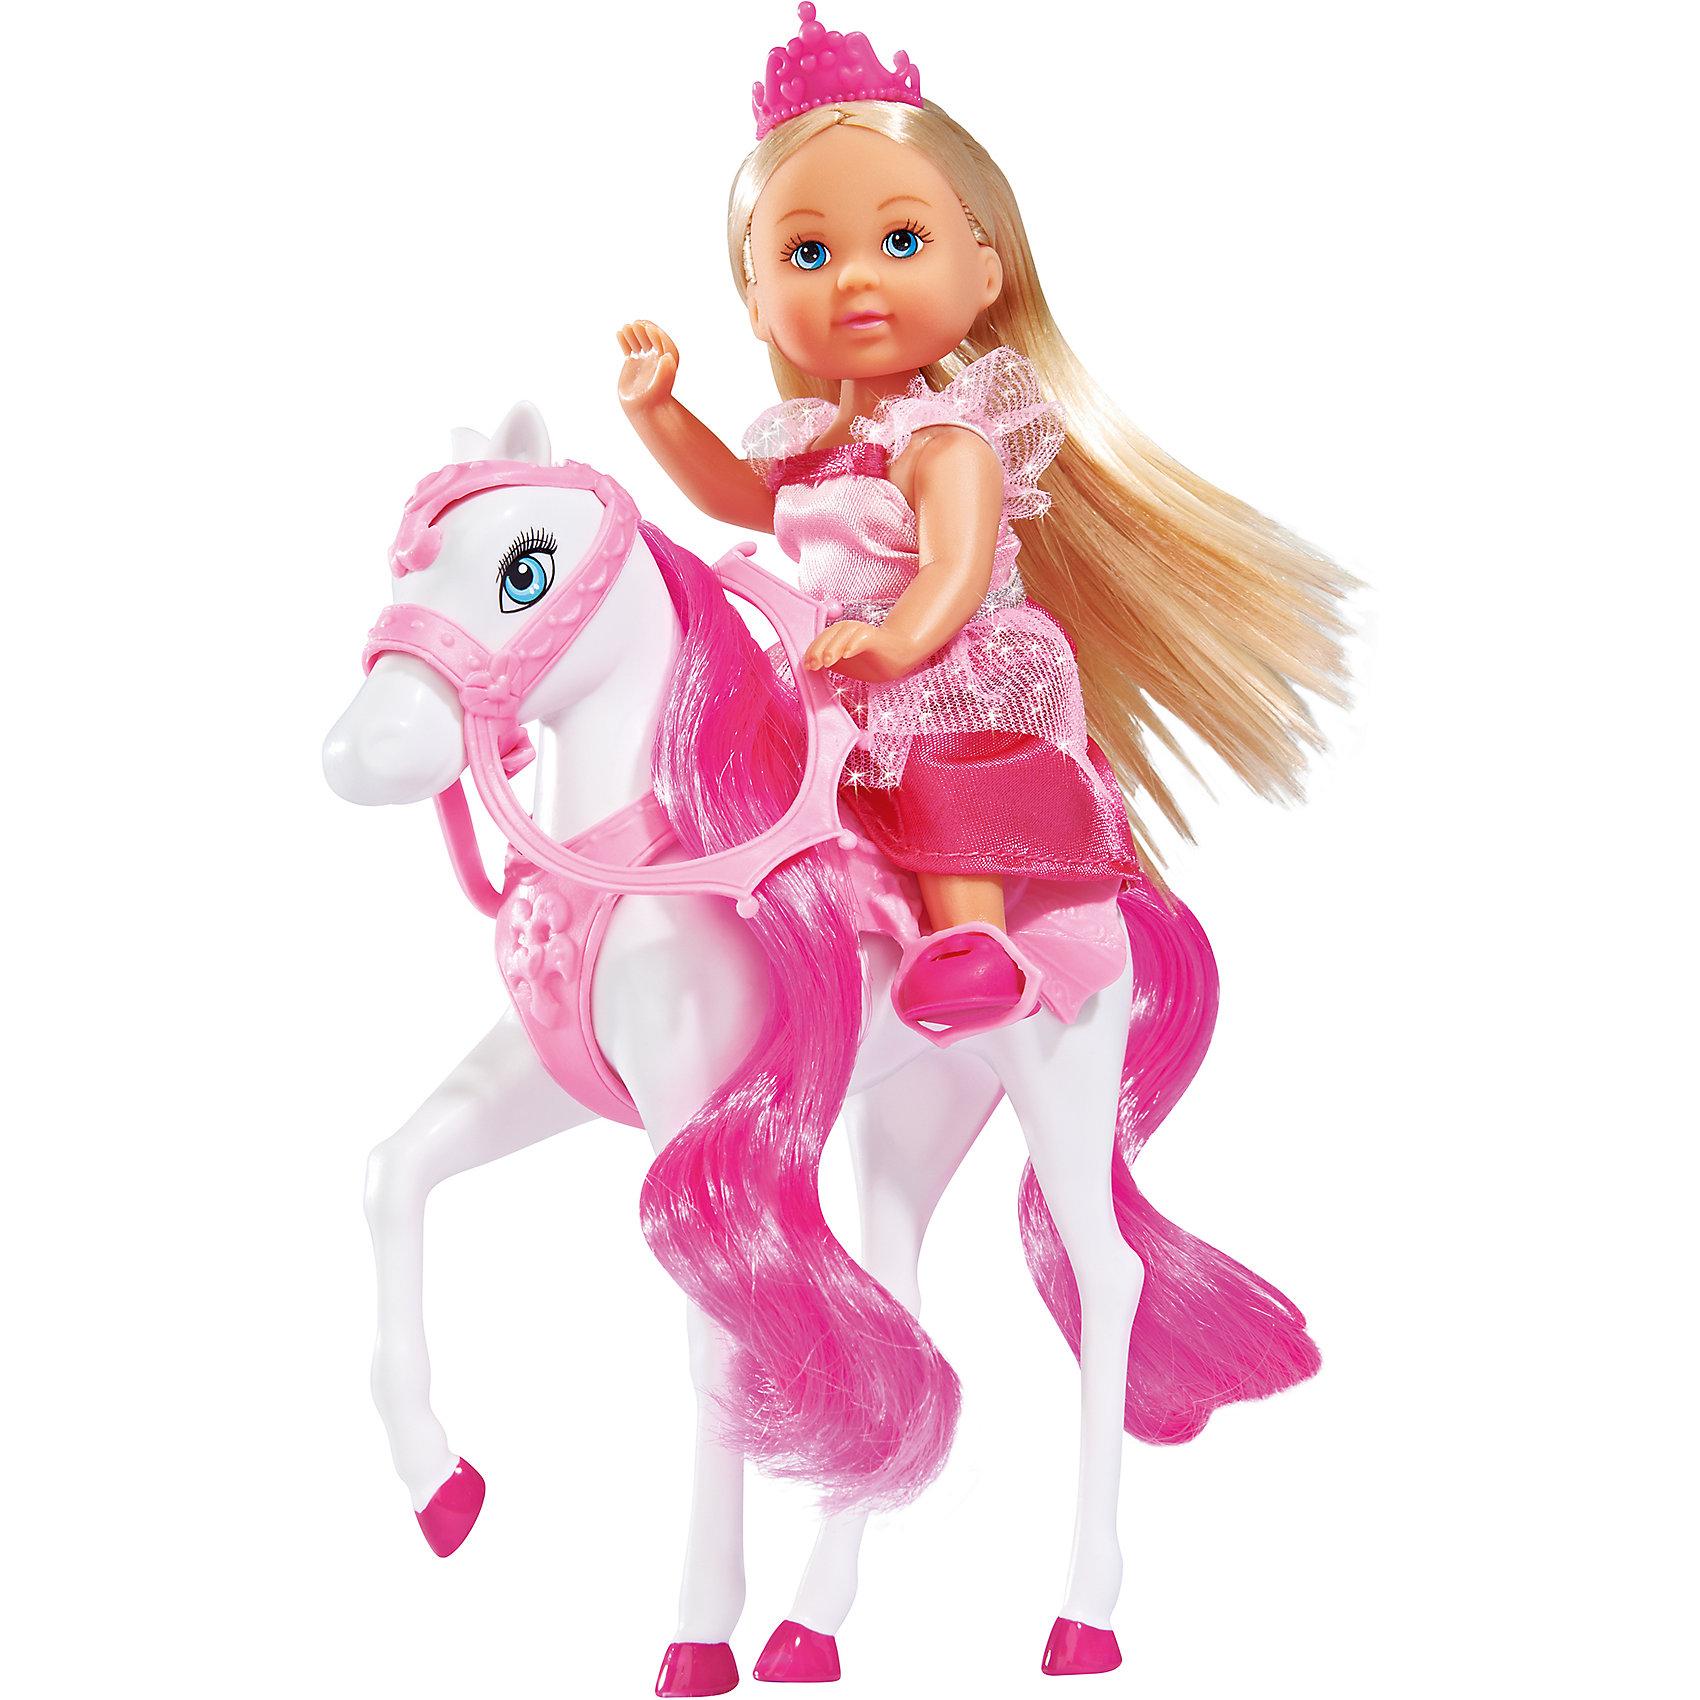 Simba Кукла Еви на лошади, Simba лен обл купить продать лошади